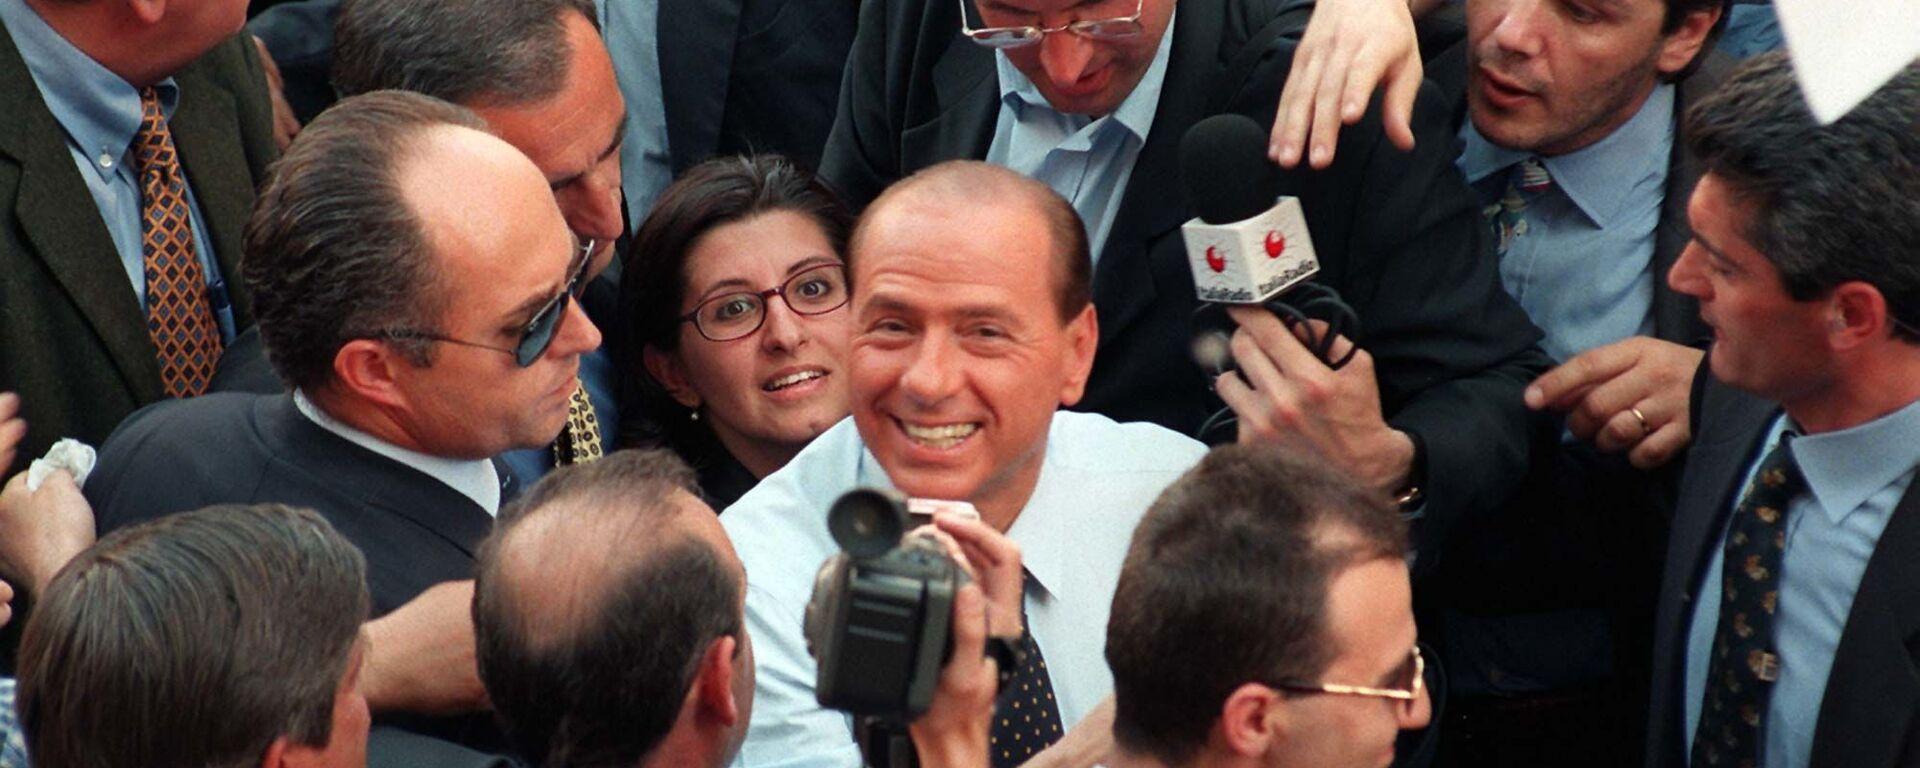 Сильвио Берлускони во время митинга в Милане - Sputnik Italia, 1920, 29.09.2021